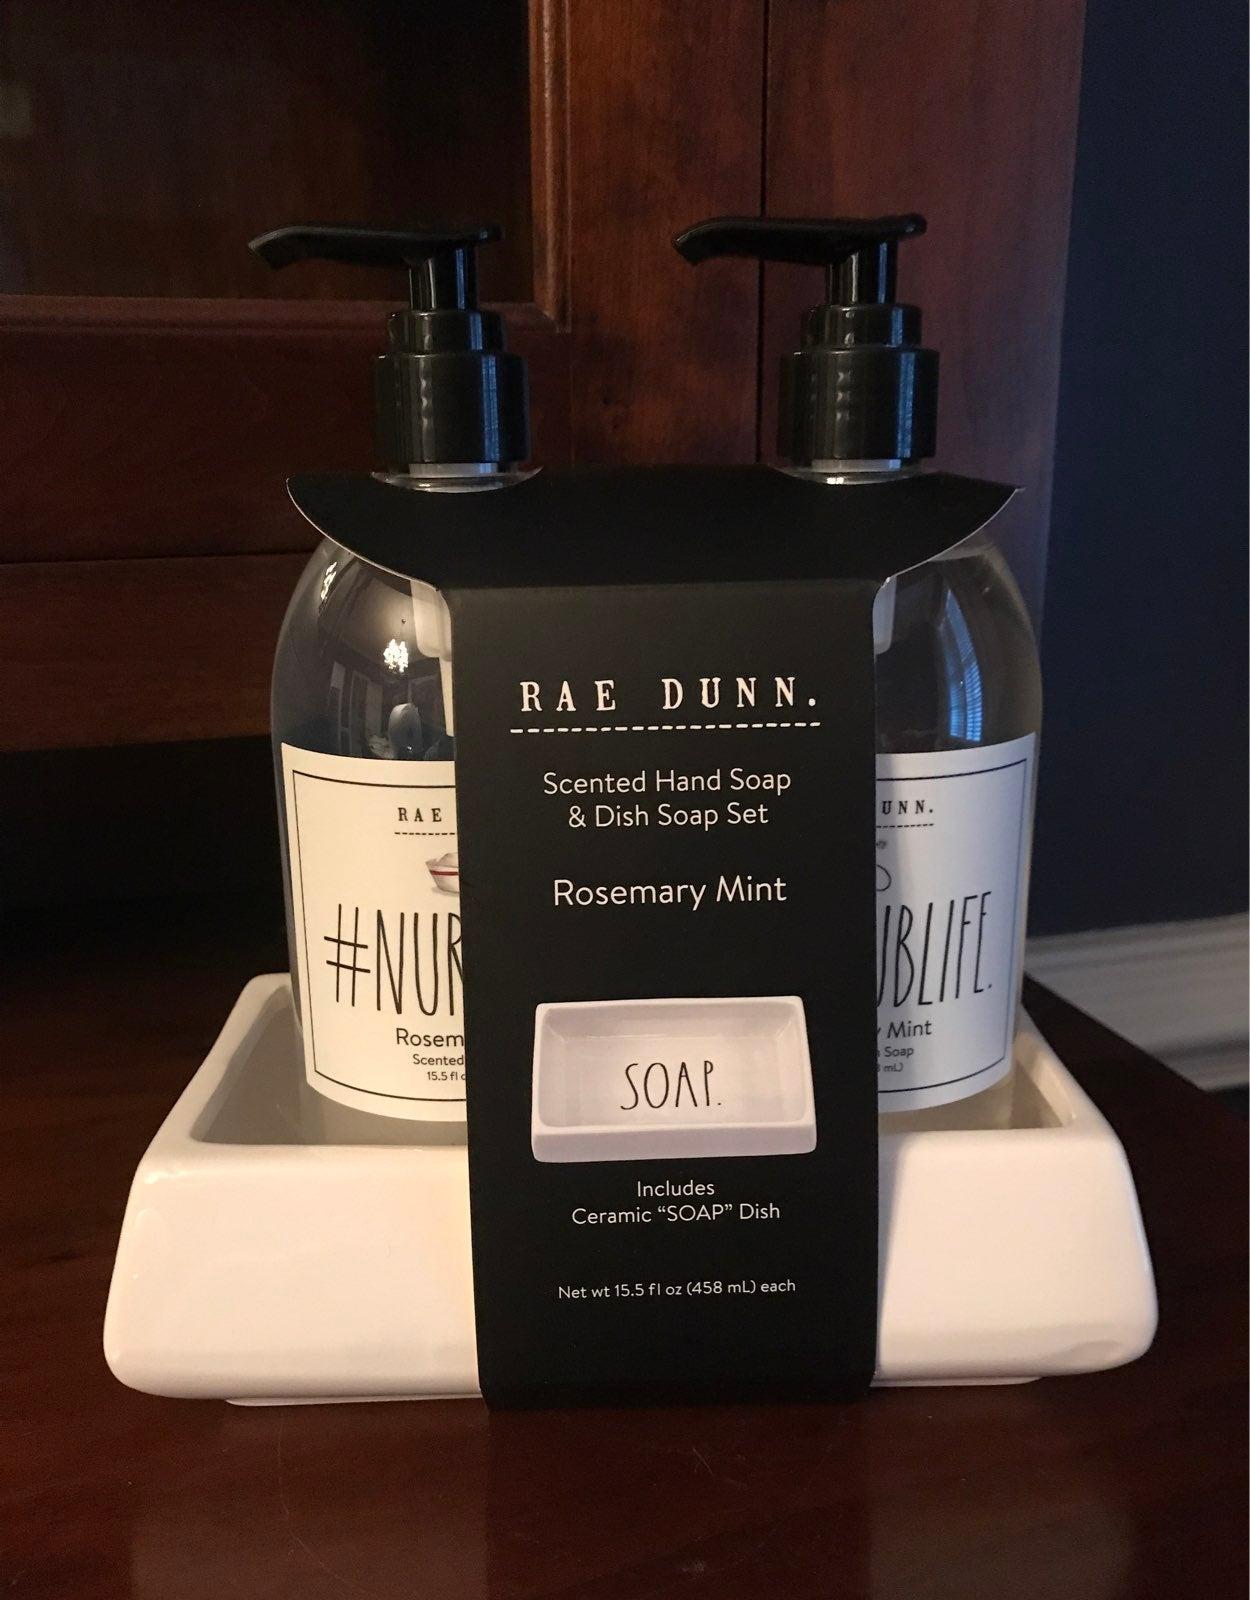 Rae Dunn NURSE Hand & Dish Soap Set